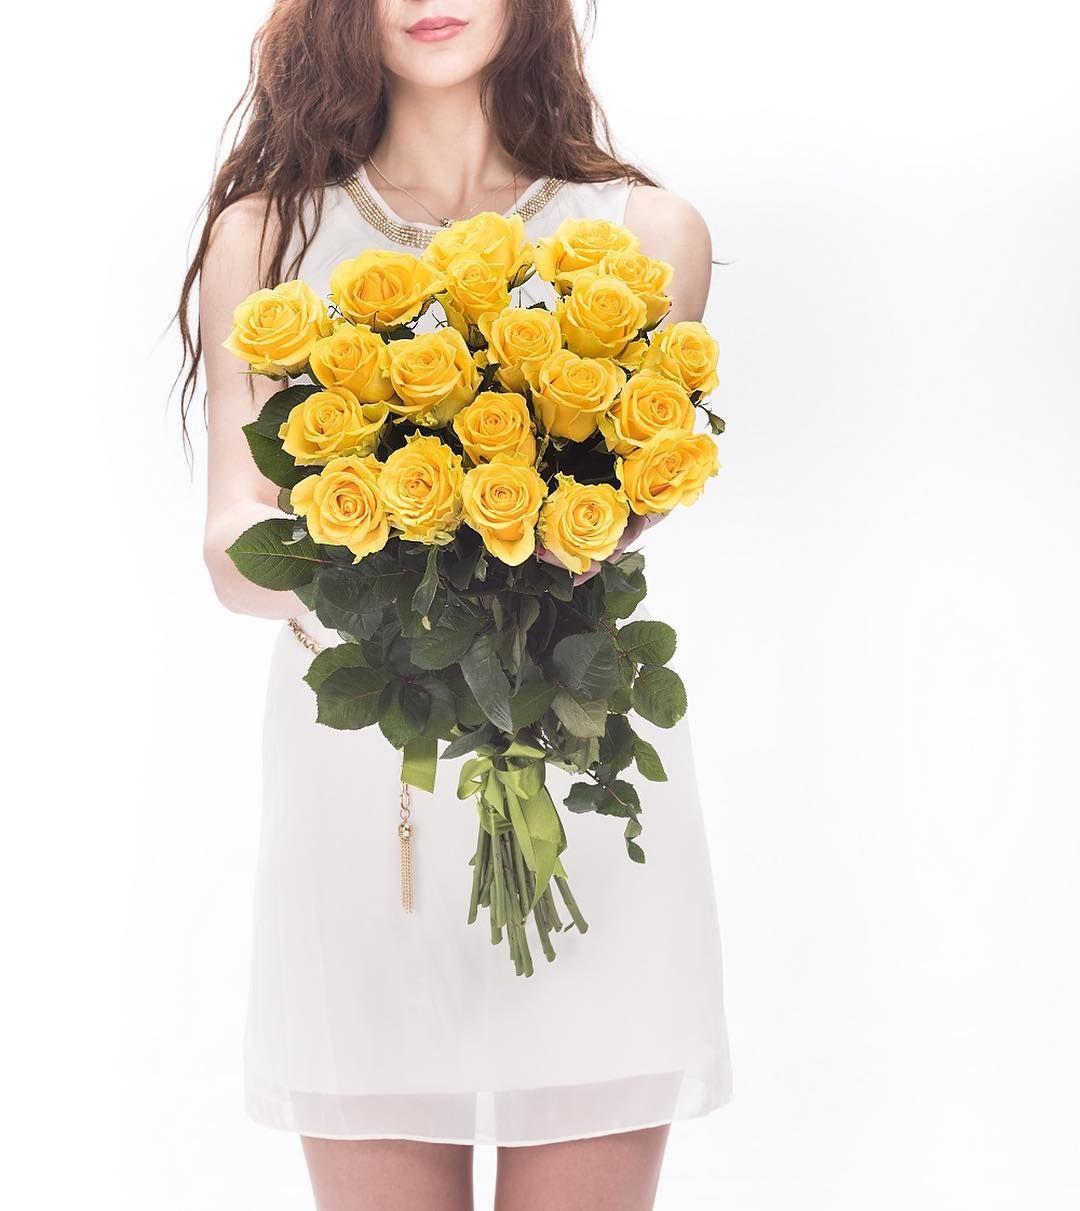 Цветы, доставка цветов ереван ани роз